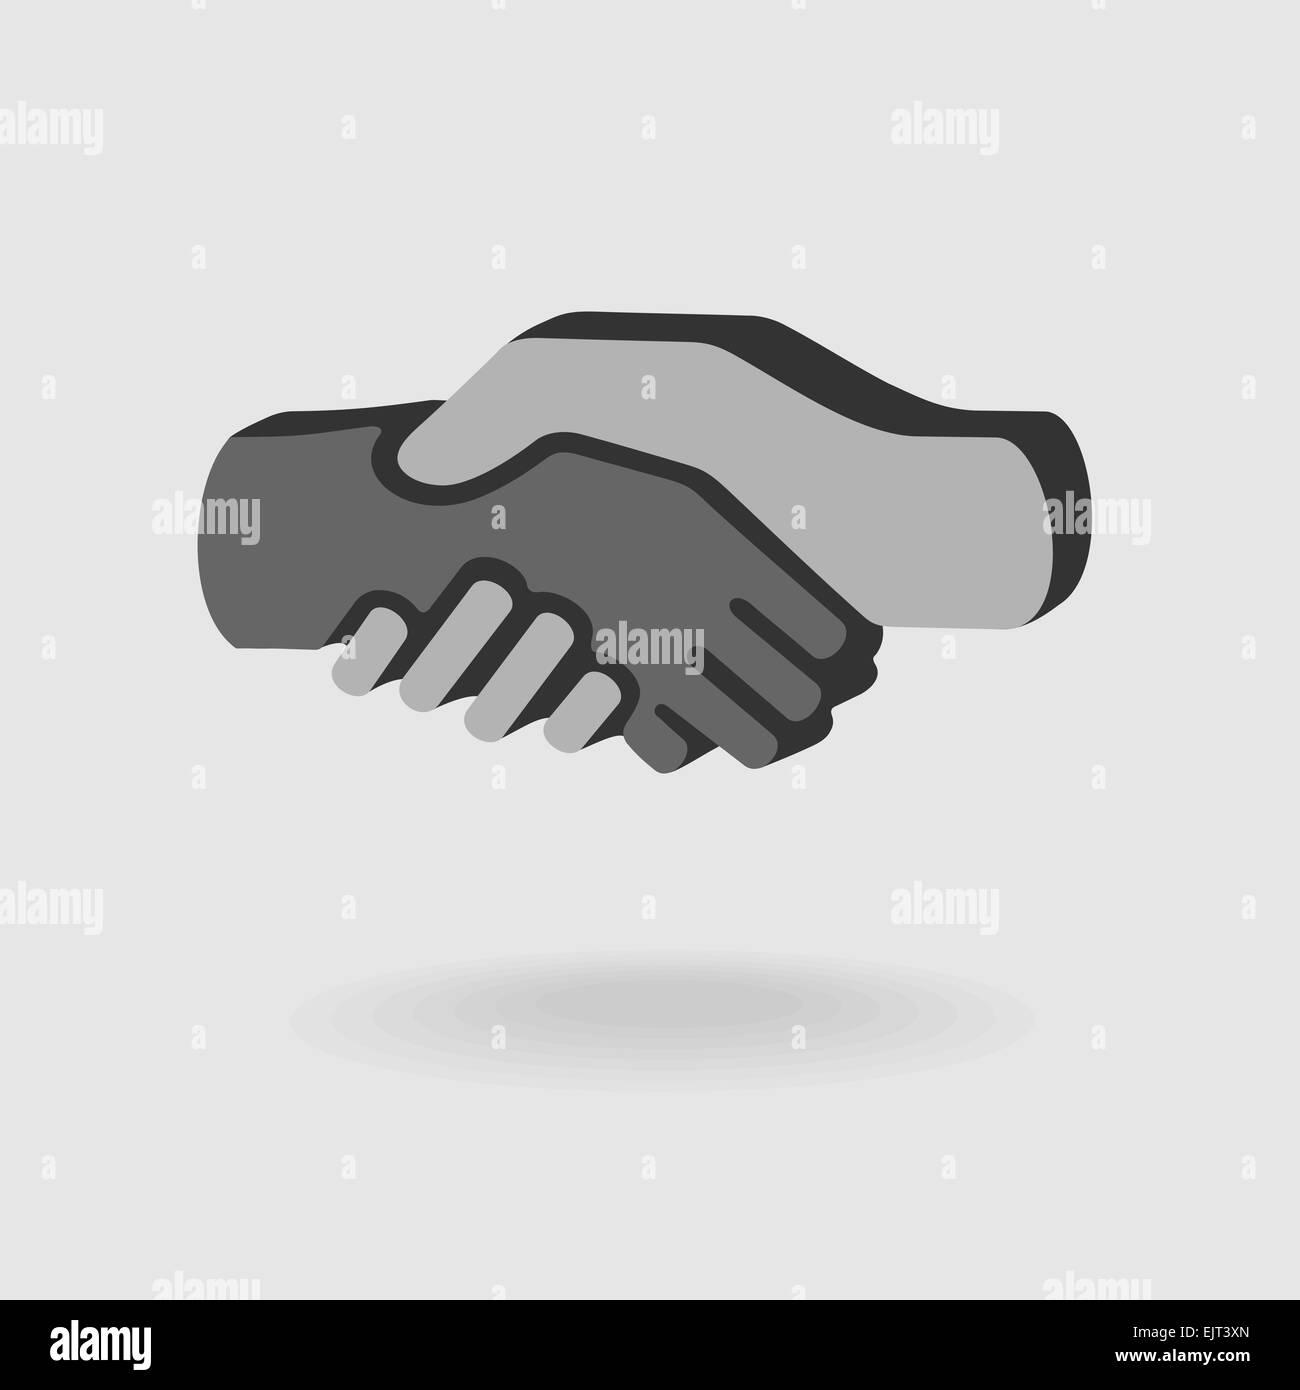 Apretón de manos símbolo Imagen De Stock